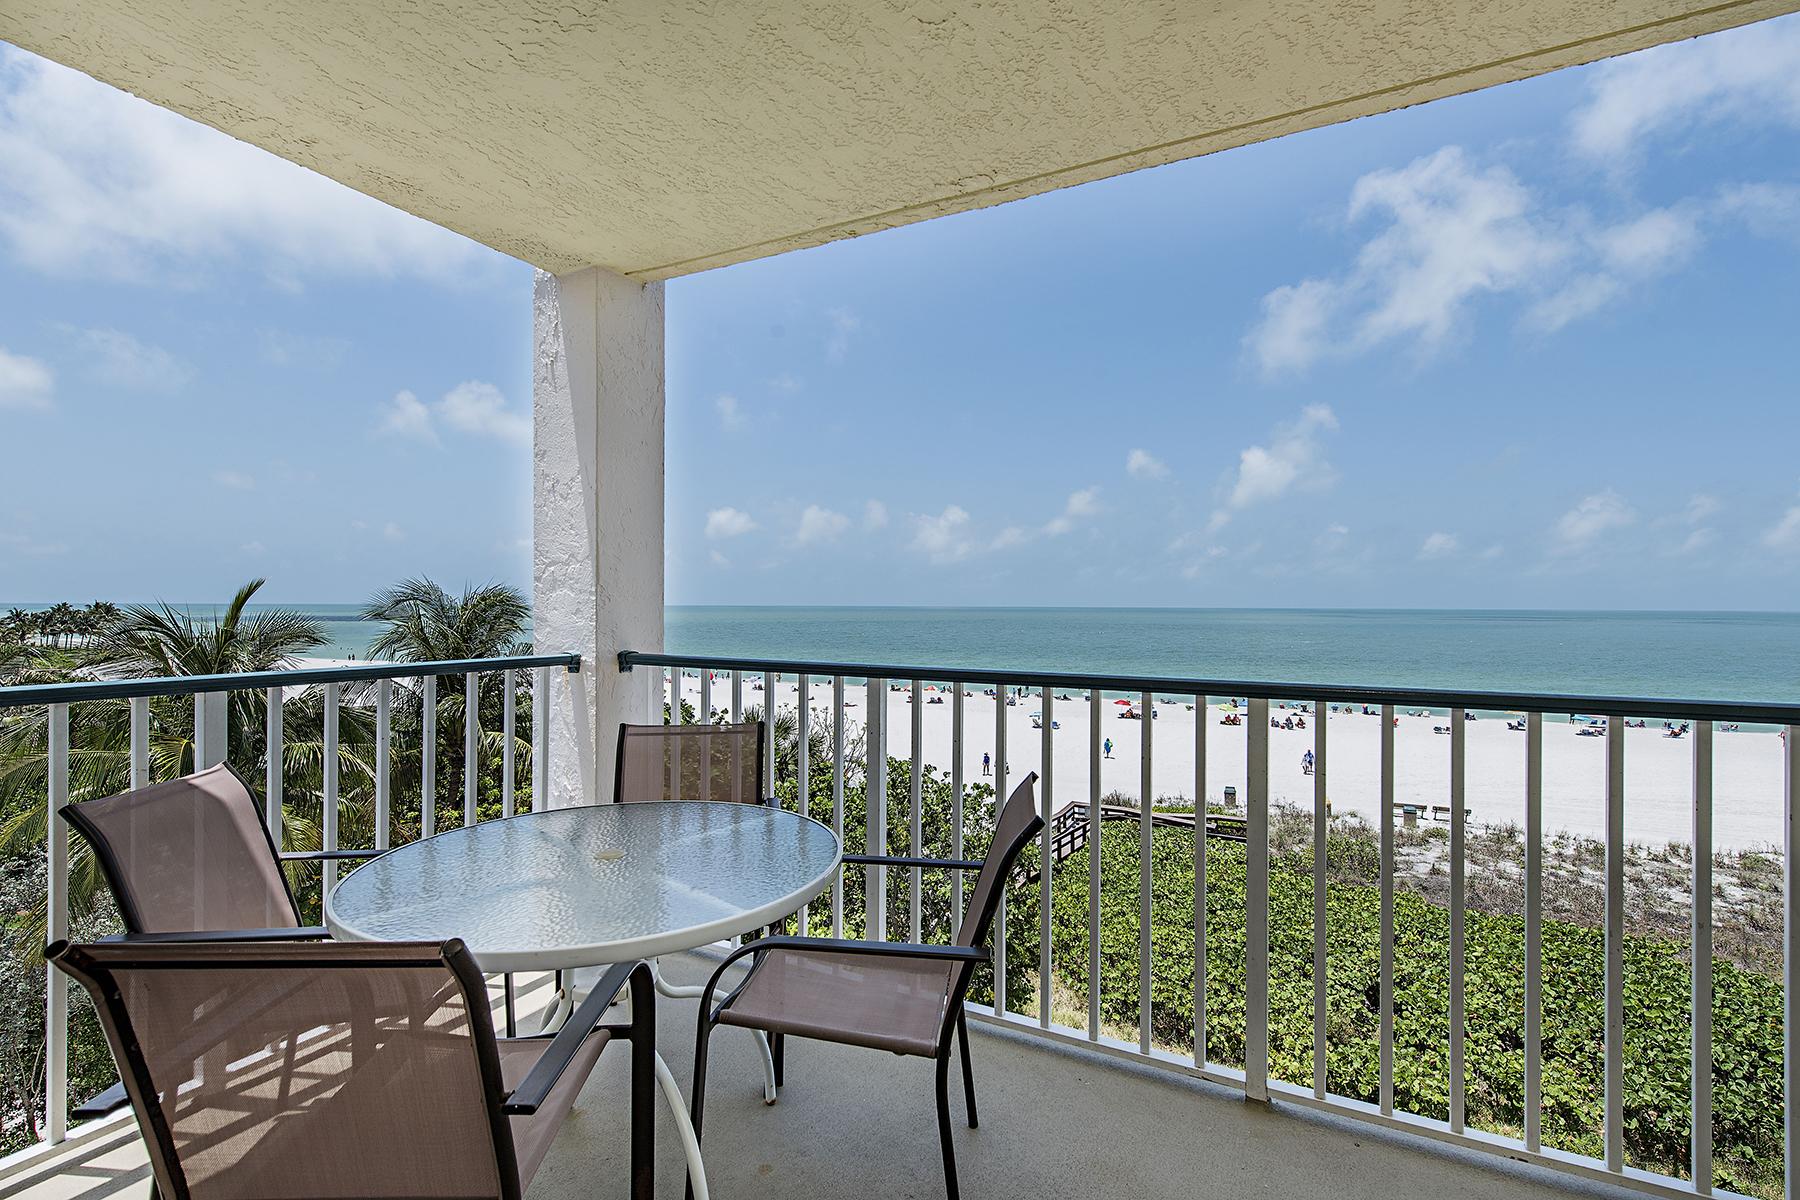 Nhà chung cư vì Bán tại MARCO ISLAND - APOLLO 900 S Collier Blvd 401 Marco Island, Florida, 34145 Hoa Kỳ